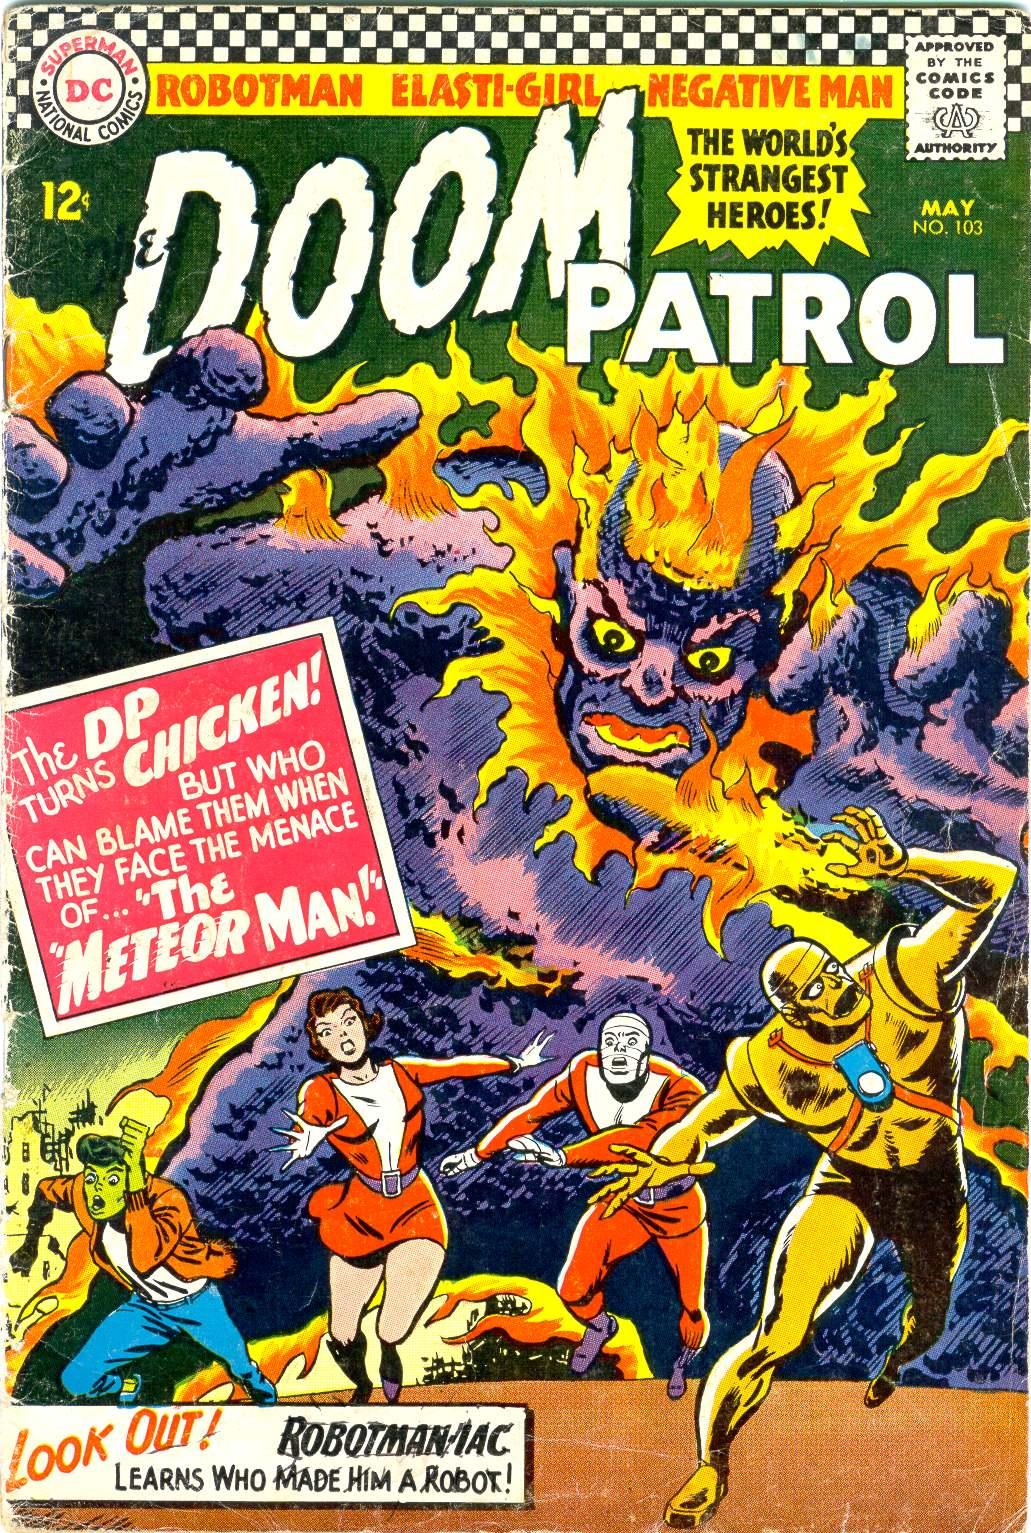 Leer Doom Patrol Volumen 1 Online en Español